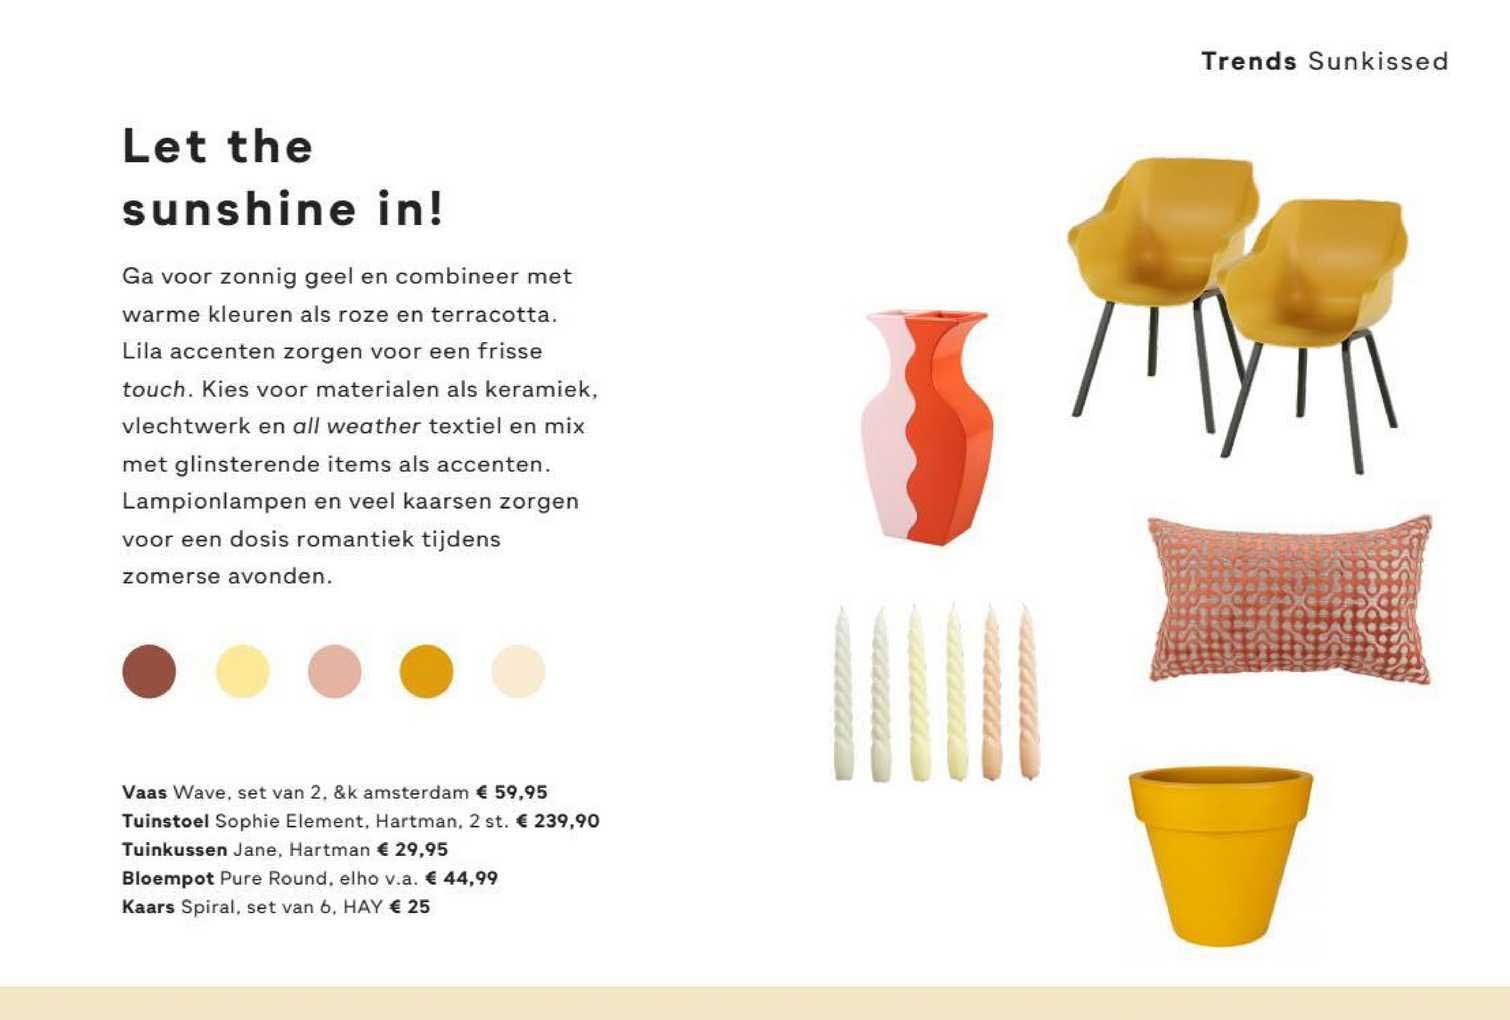 FonQ Vaas Wave &K Amsterdam, Tuinstoel Sophie Element Hartman, Tuinkussen Jane Hartman, Bloempot Pure Round Elho Of Kaars Spiral Hay